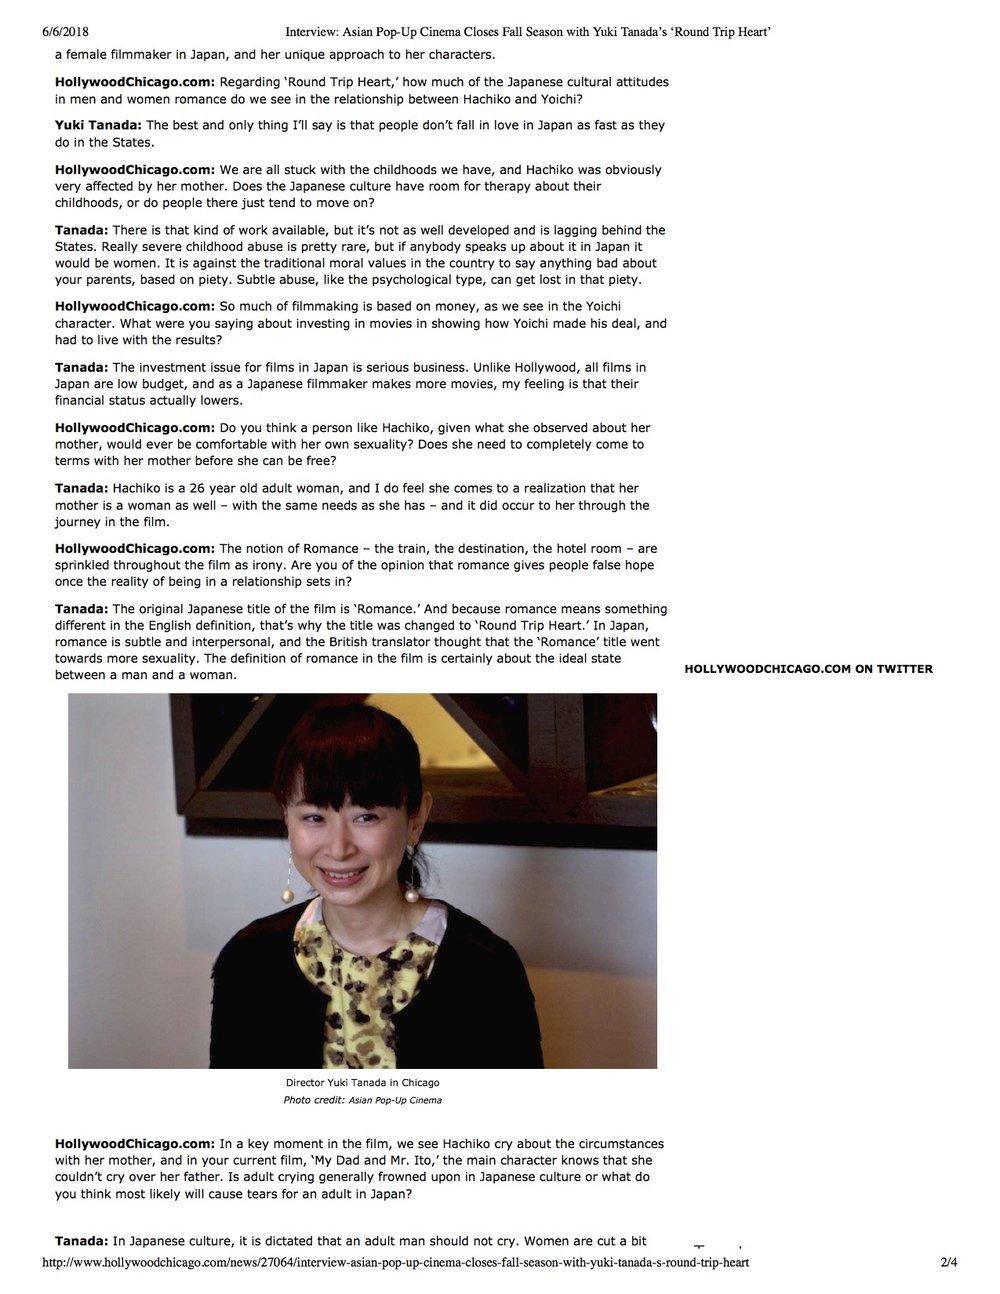 2Interview_ Asian Pop-Up Cinema Closes Fall Season with Yuki Tanada's 'Round Trip Heart'.jpg